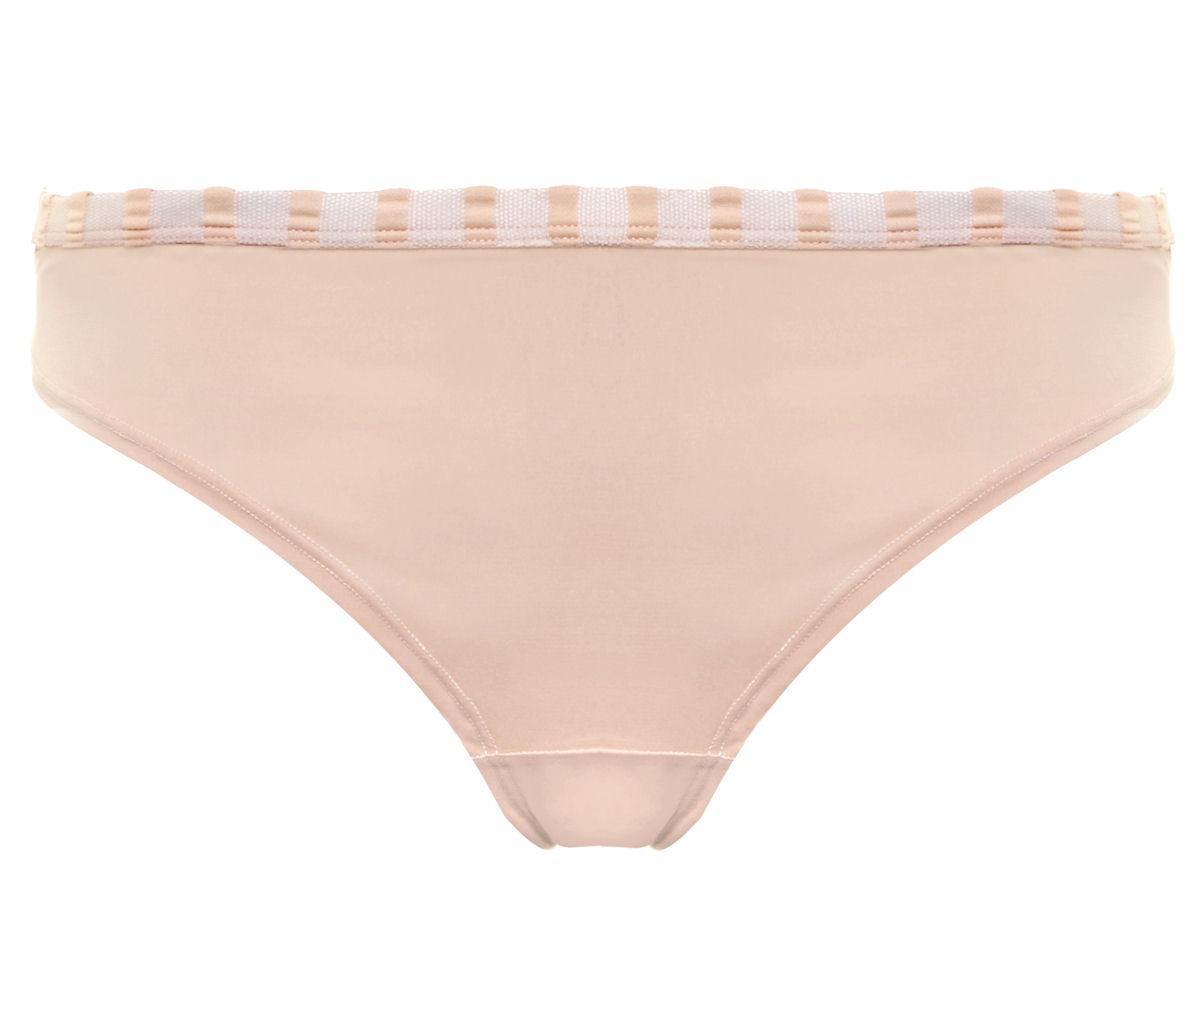 Ultimo-OMG-Cici-3521-breve-brasileno-8-10-12-14-16-18-Negro-Beige-Lenceria-Sexy